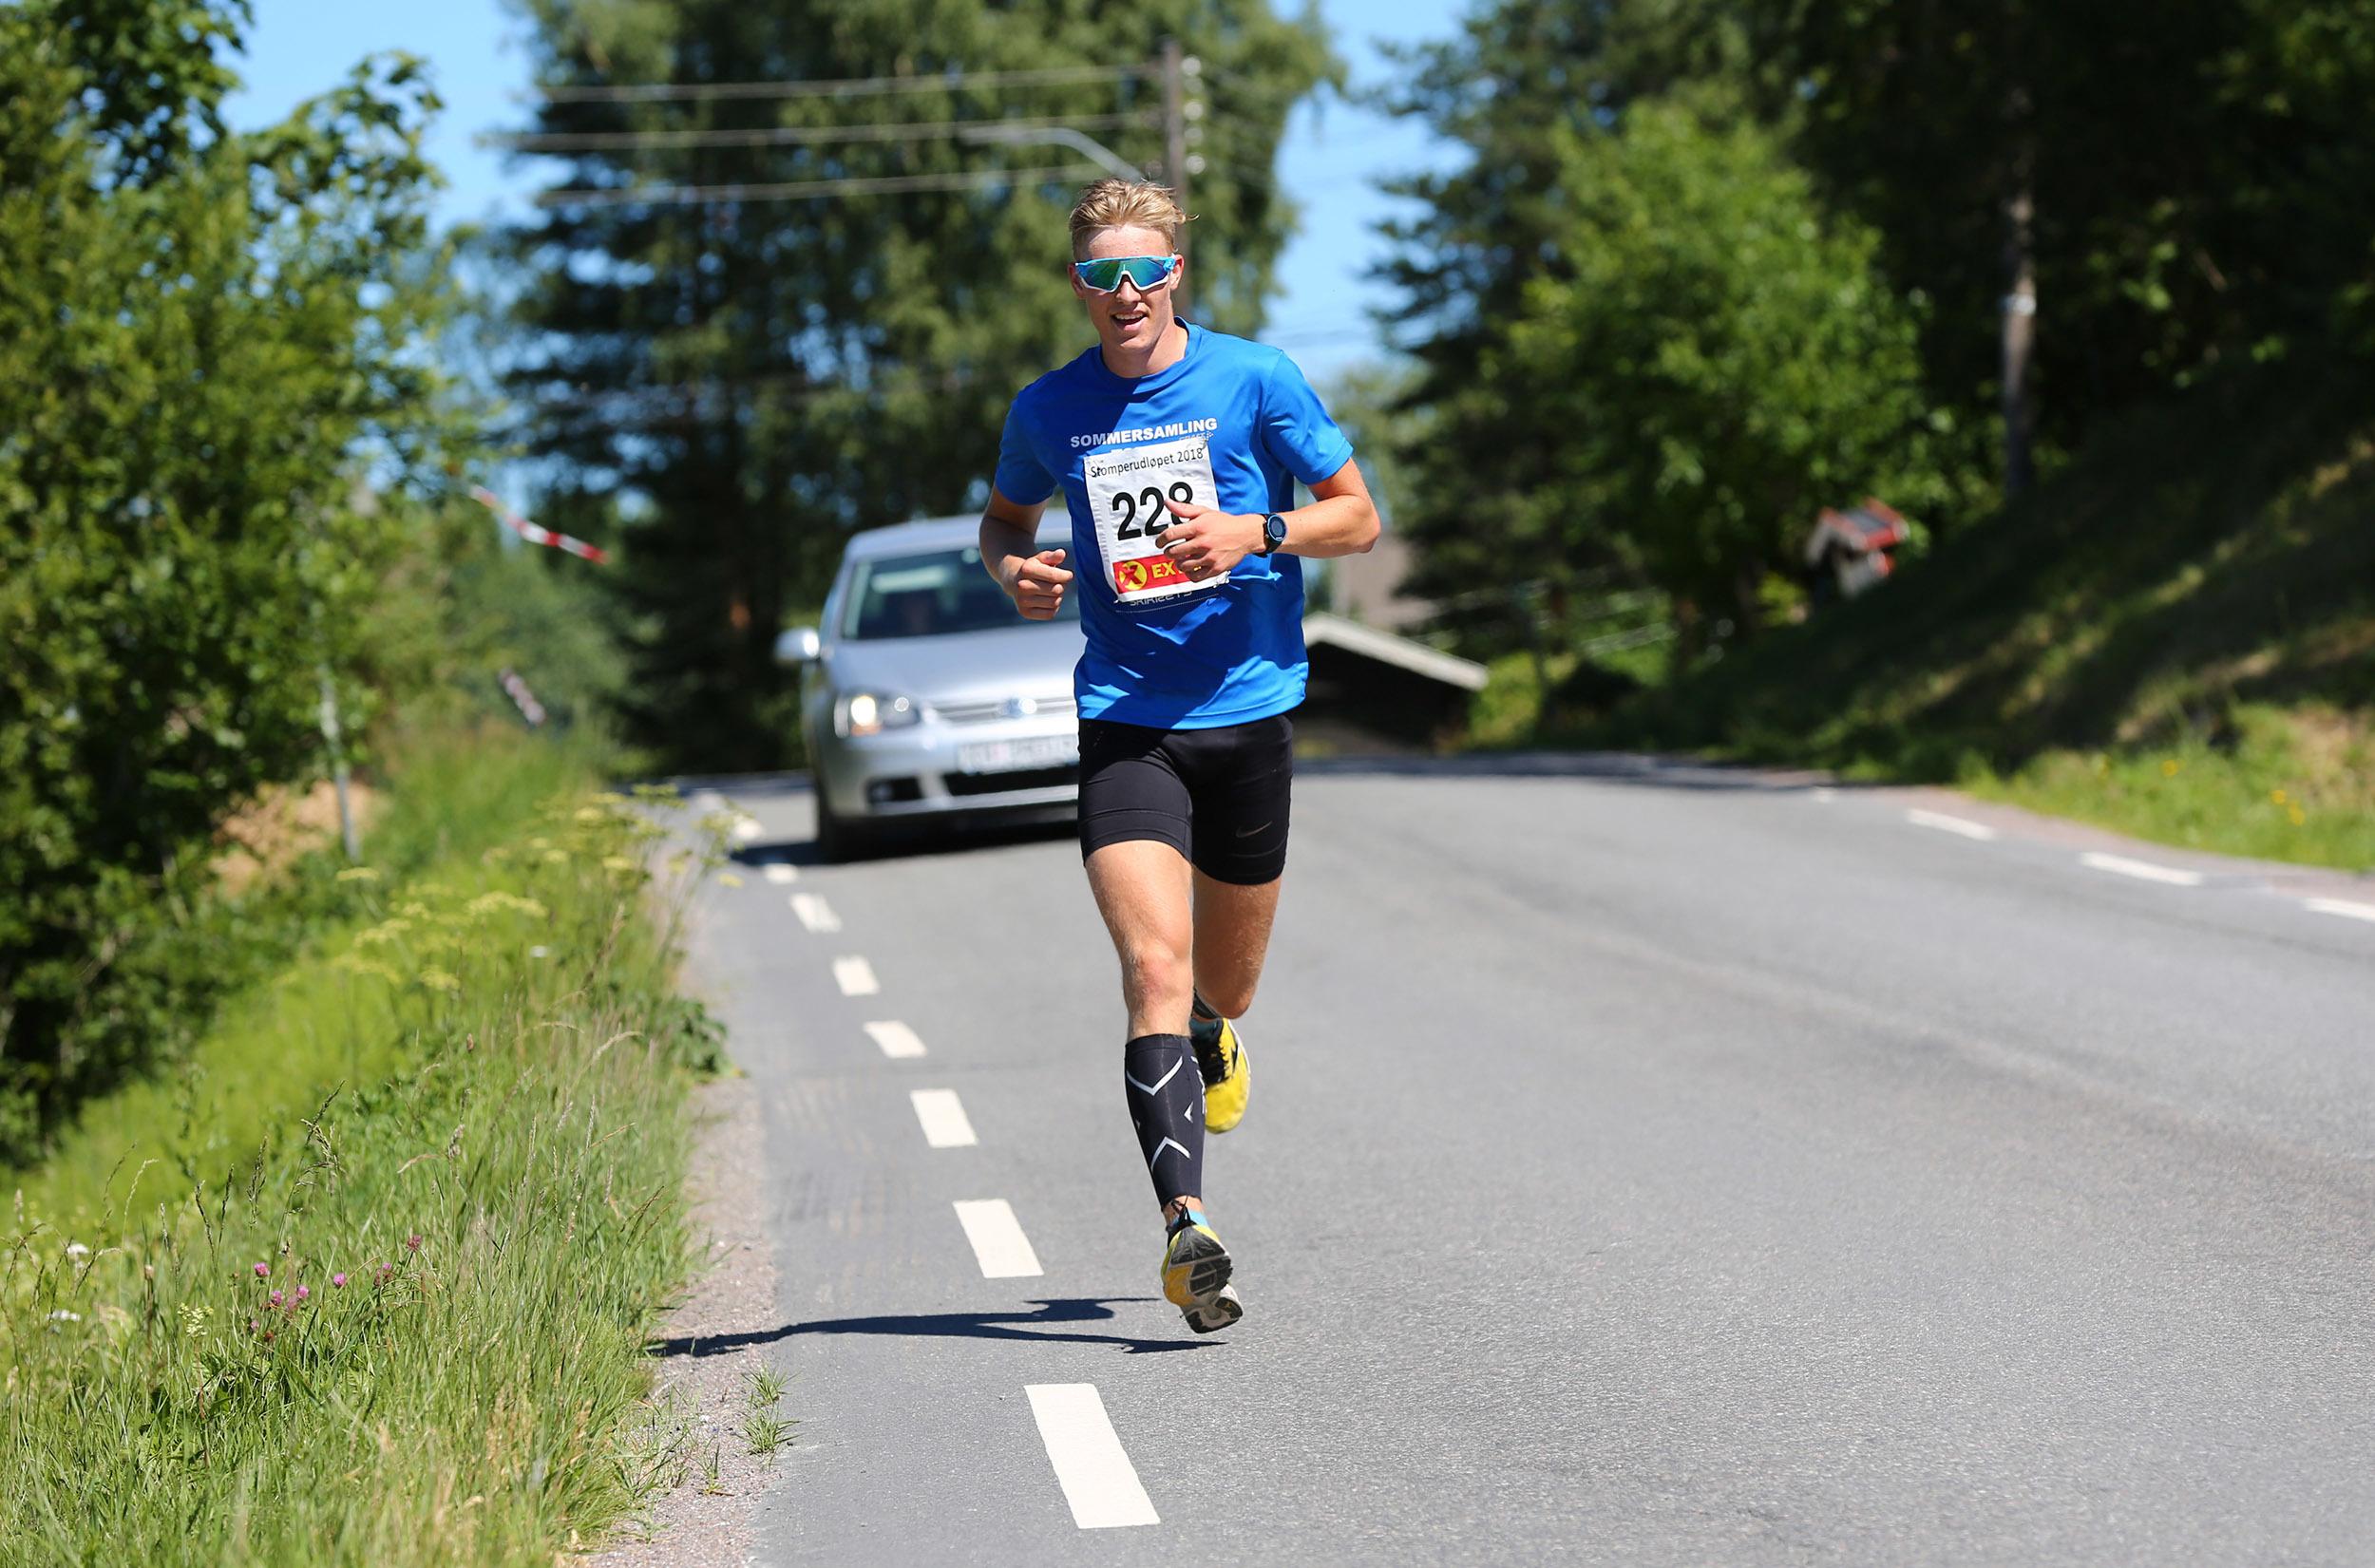 Stomperudløpet2018-17km-Ole Tobias Utne Bjerke.jpg